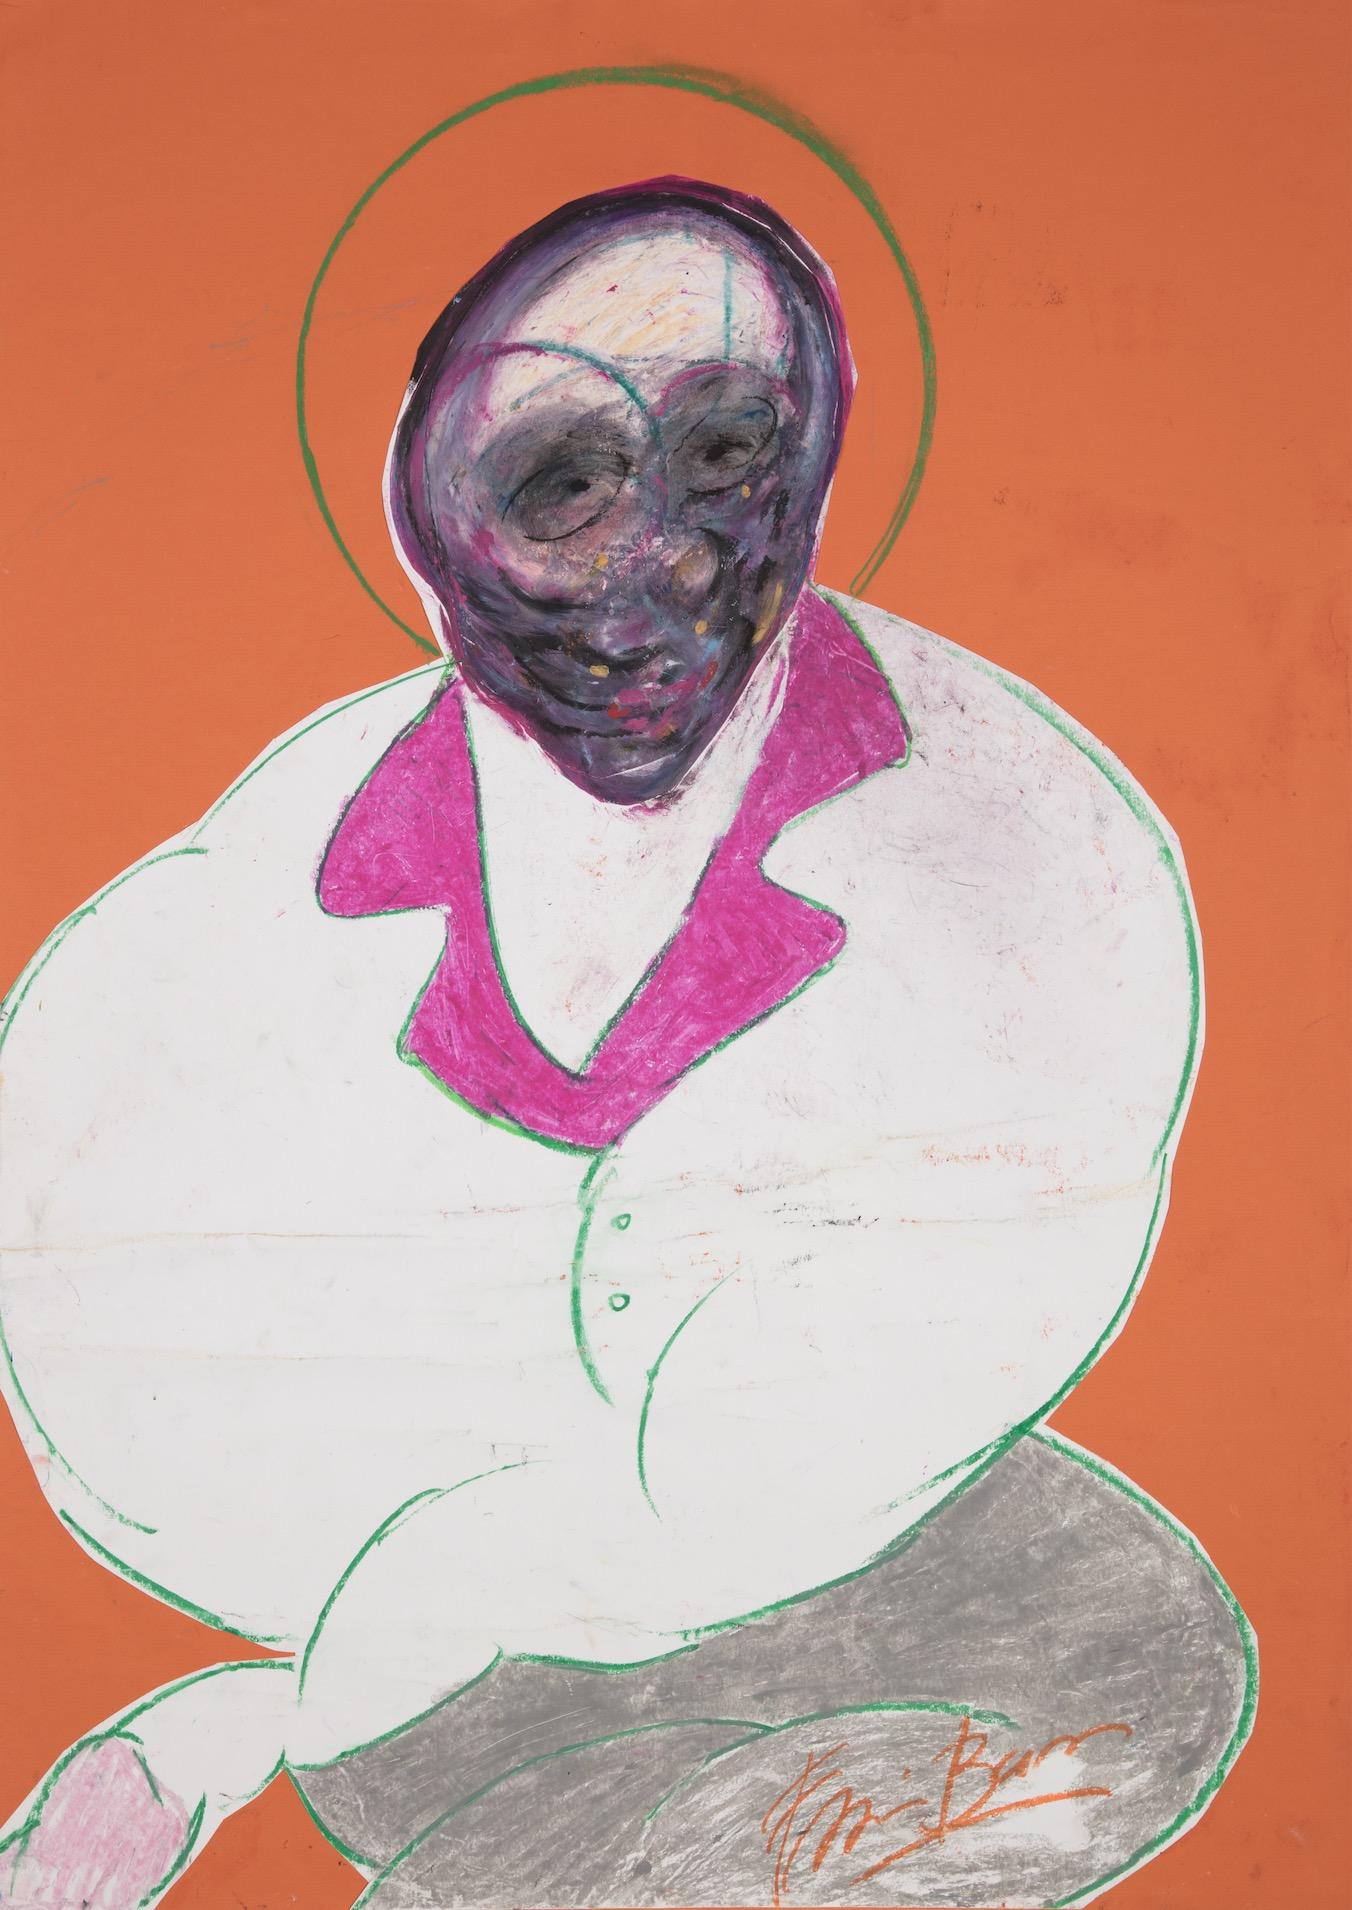 @ Francis Bacon